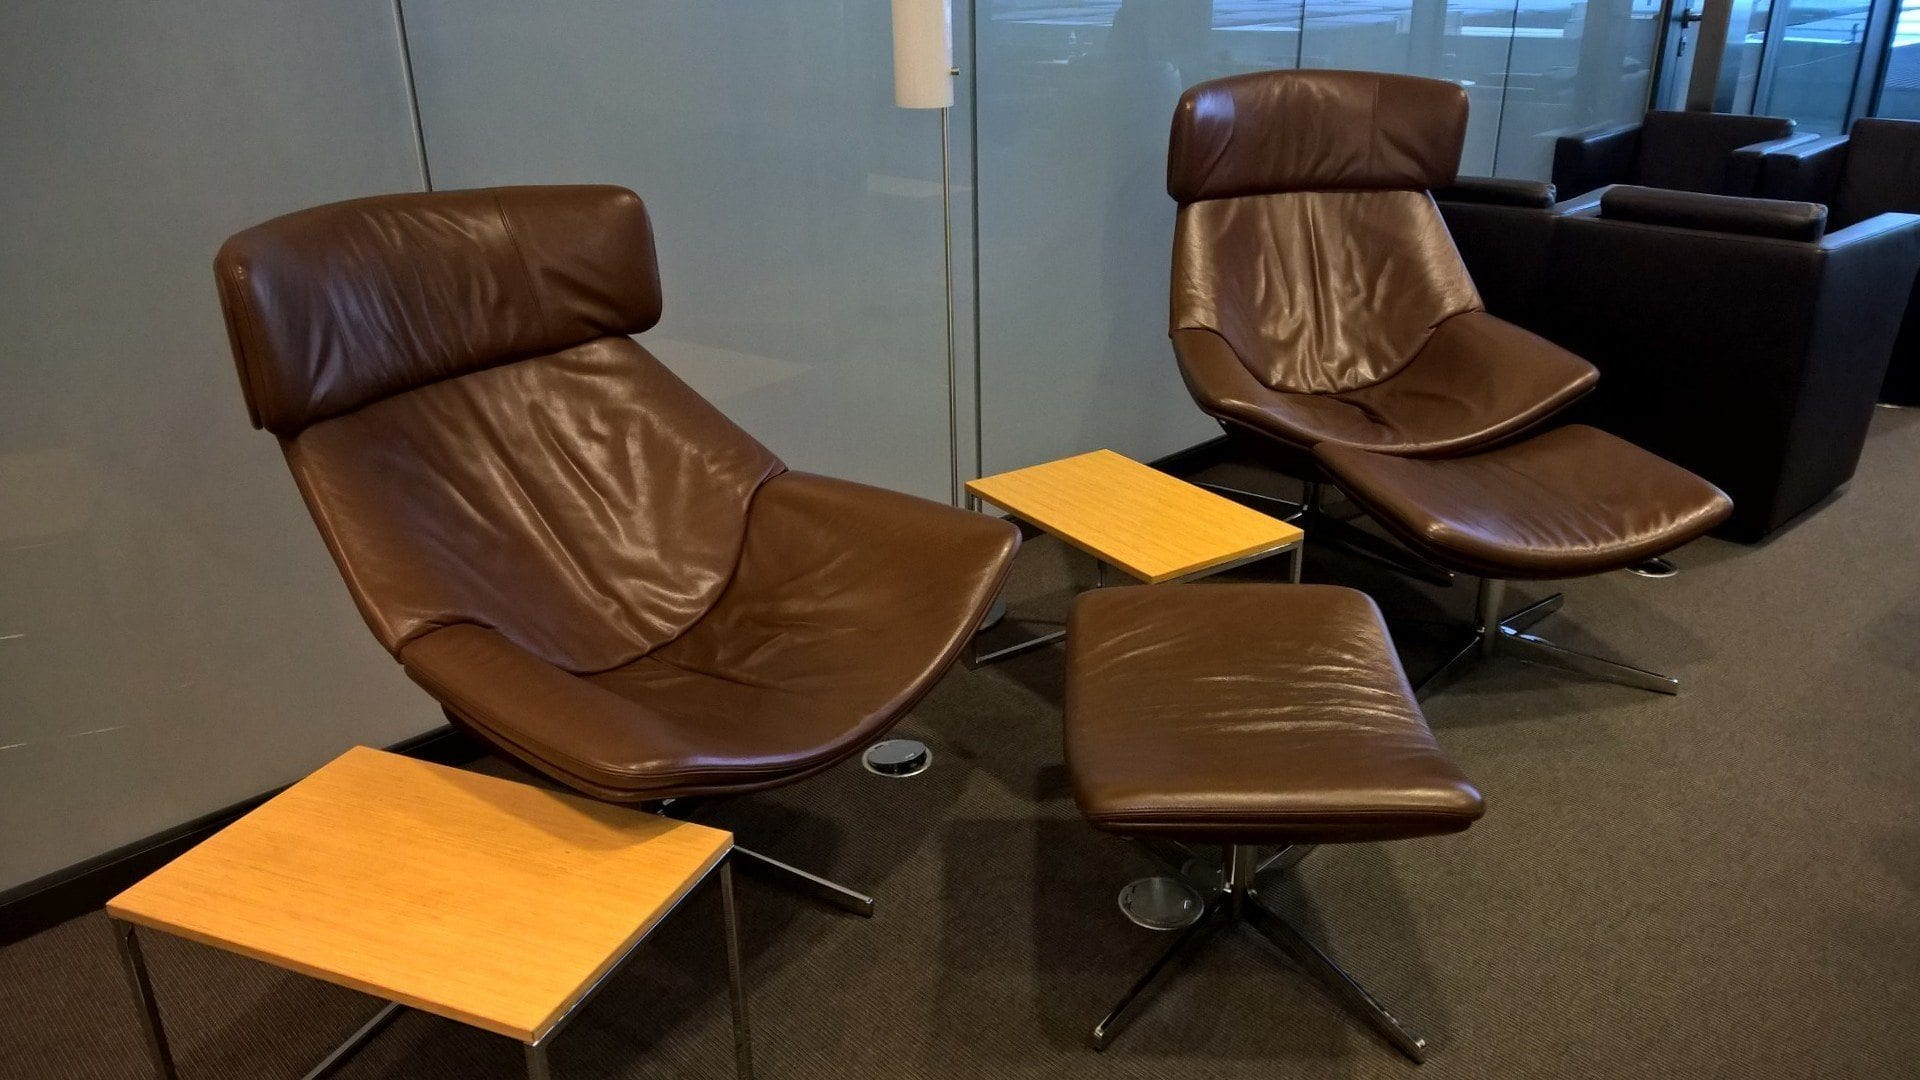 The Lounge Luxemburg